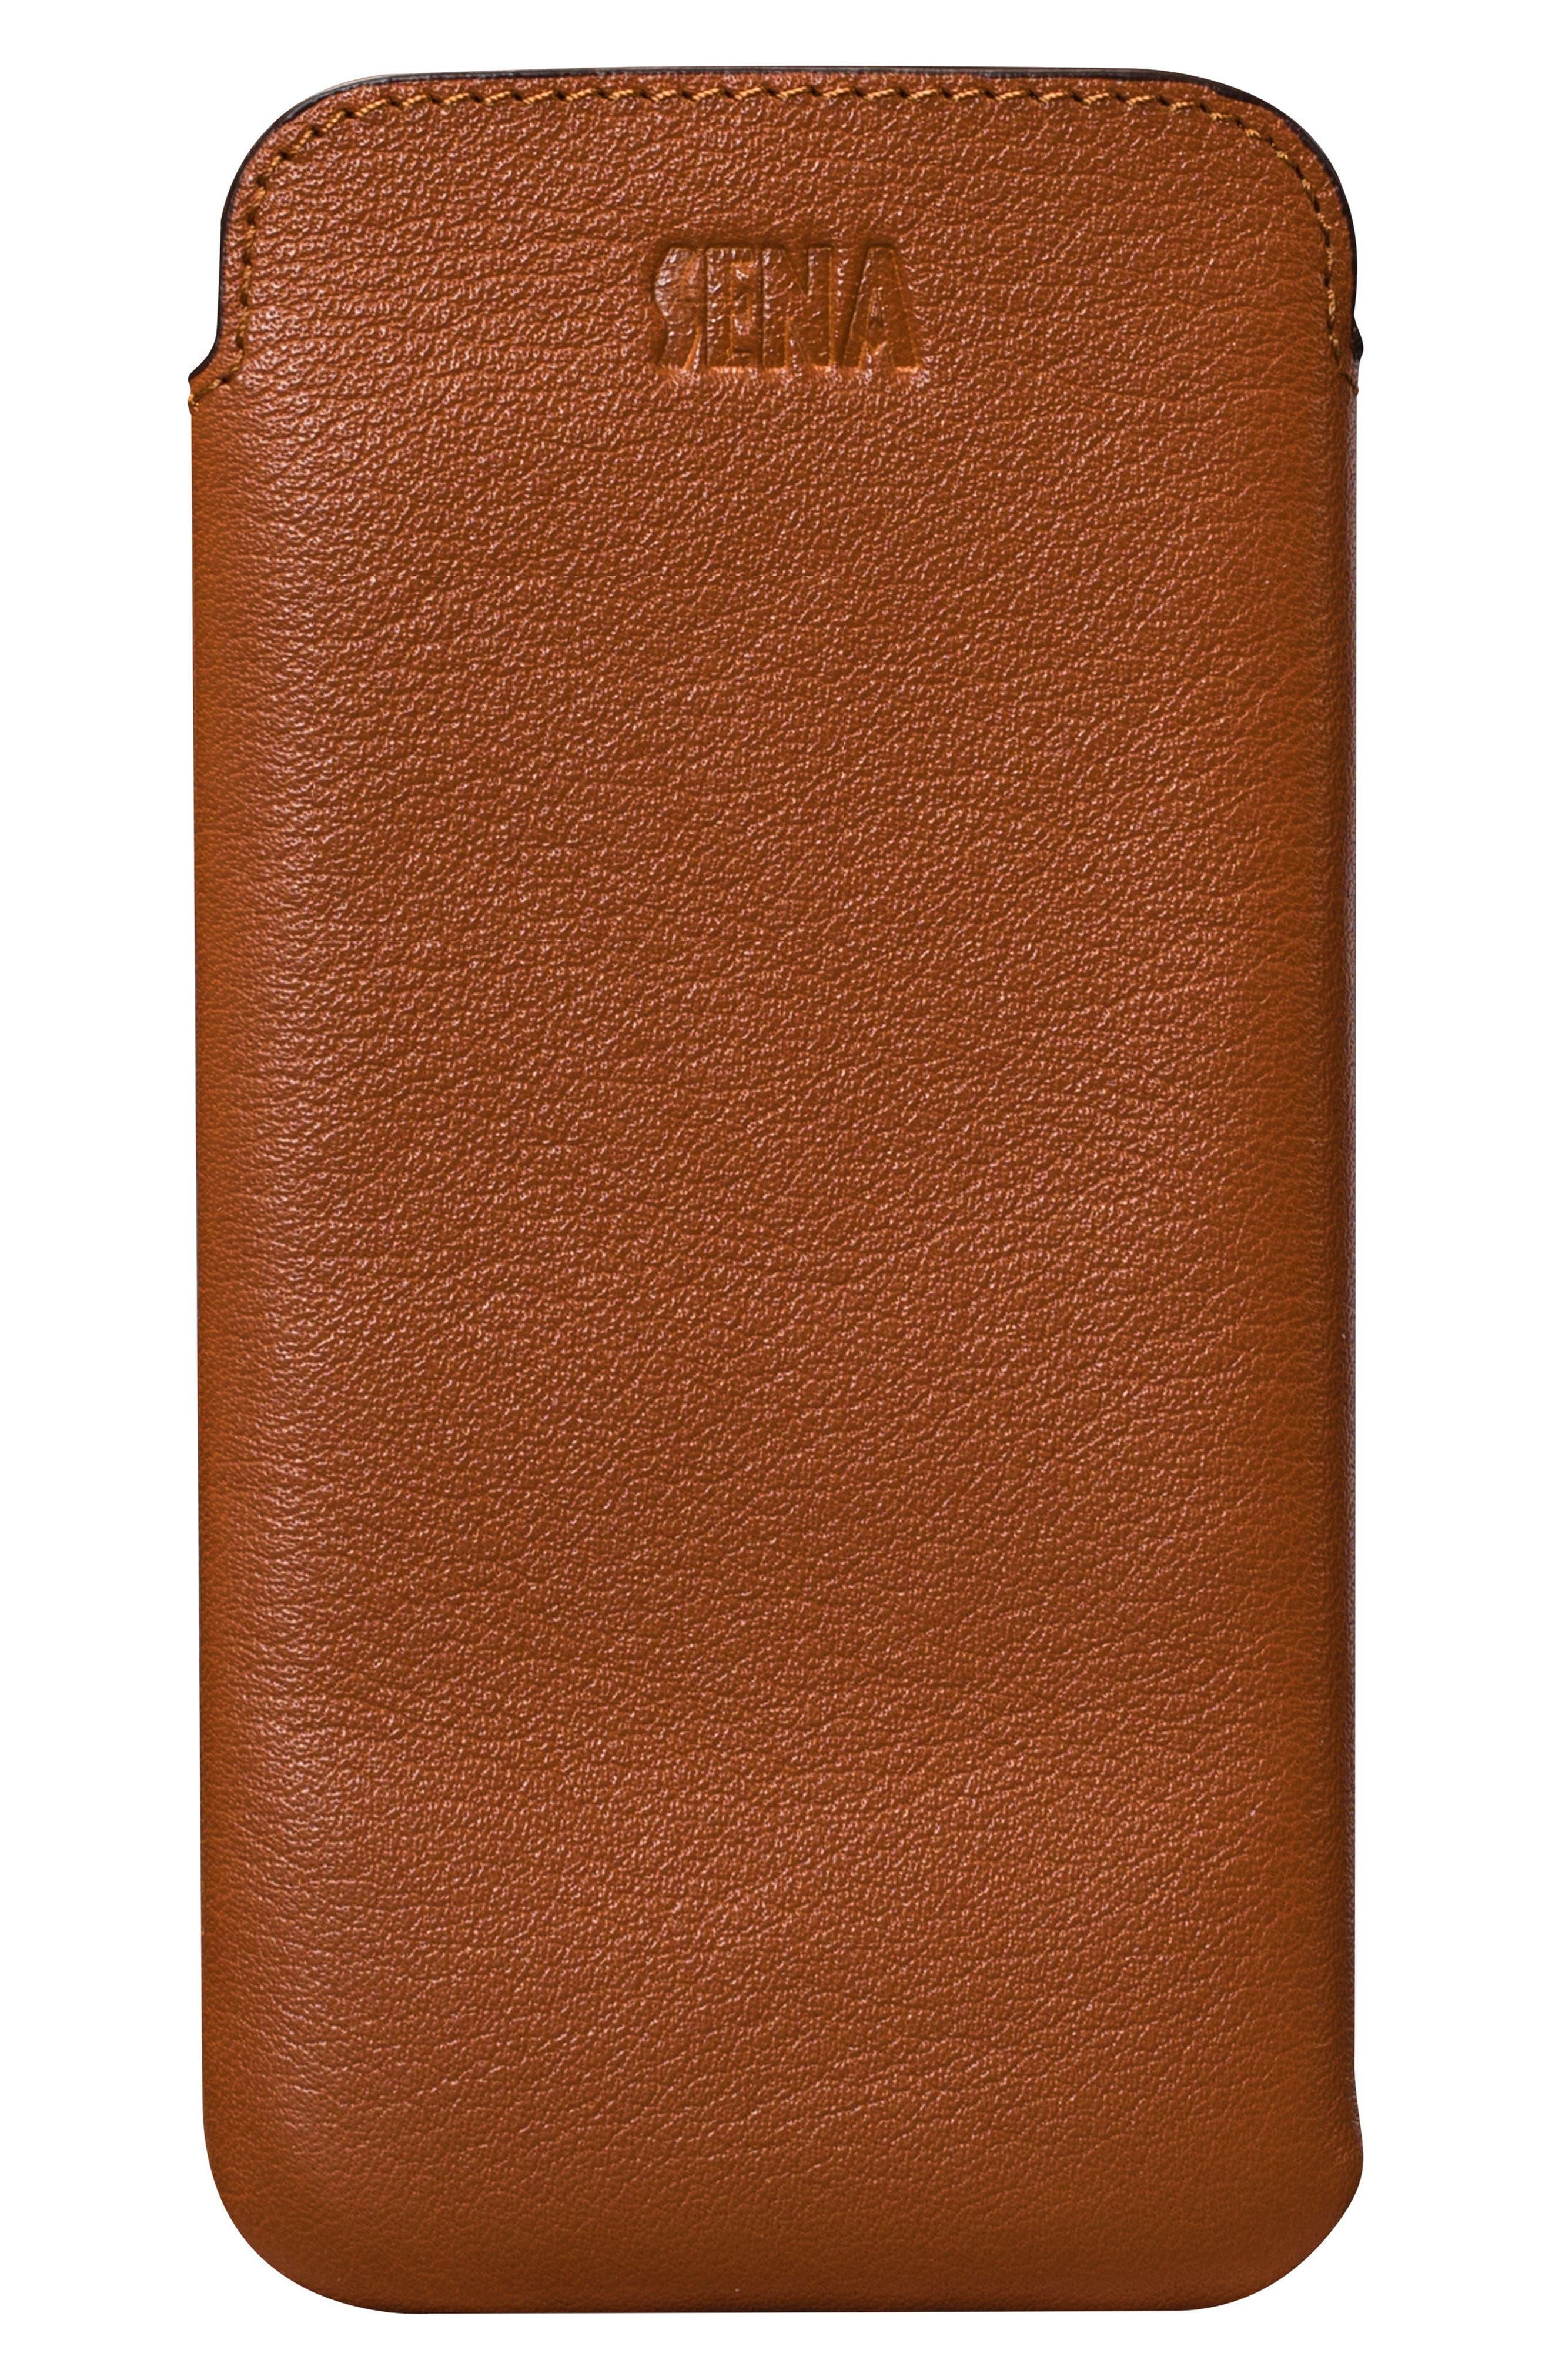 Ultraslim iPhone 6/7/8 Leather Sleeve,                         Main,                         color, Tan